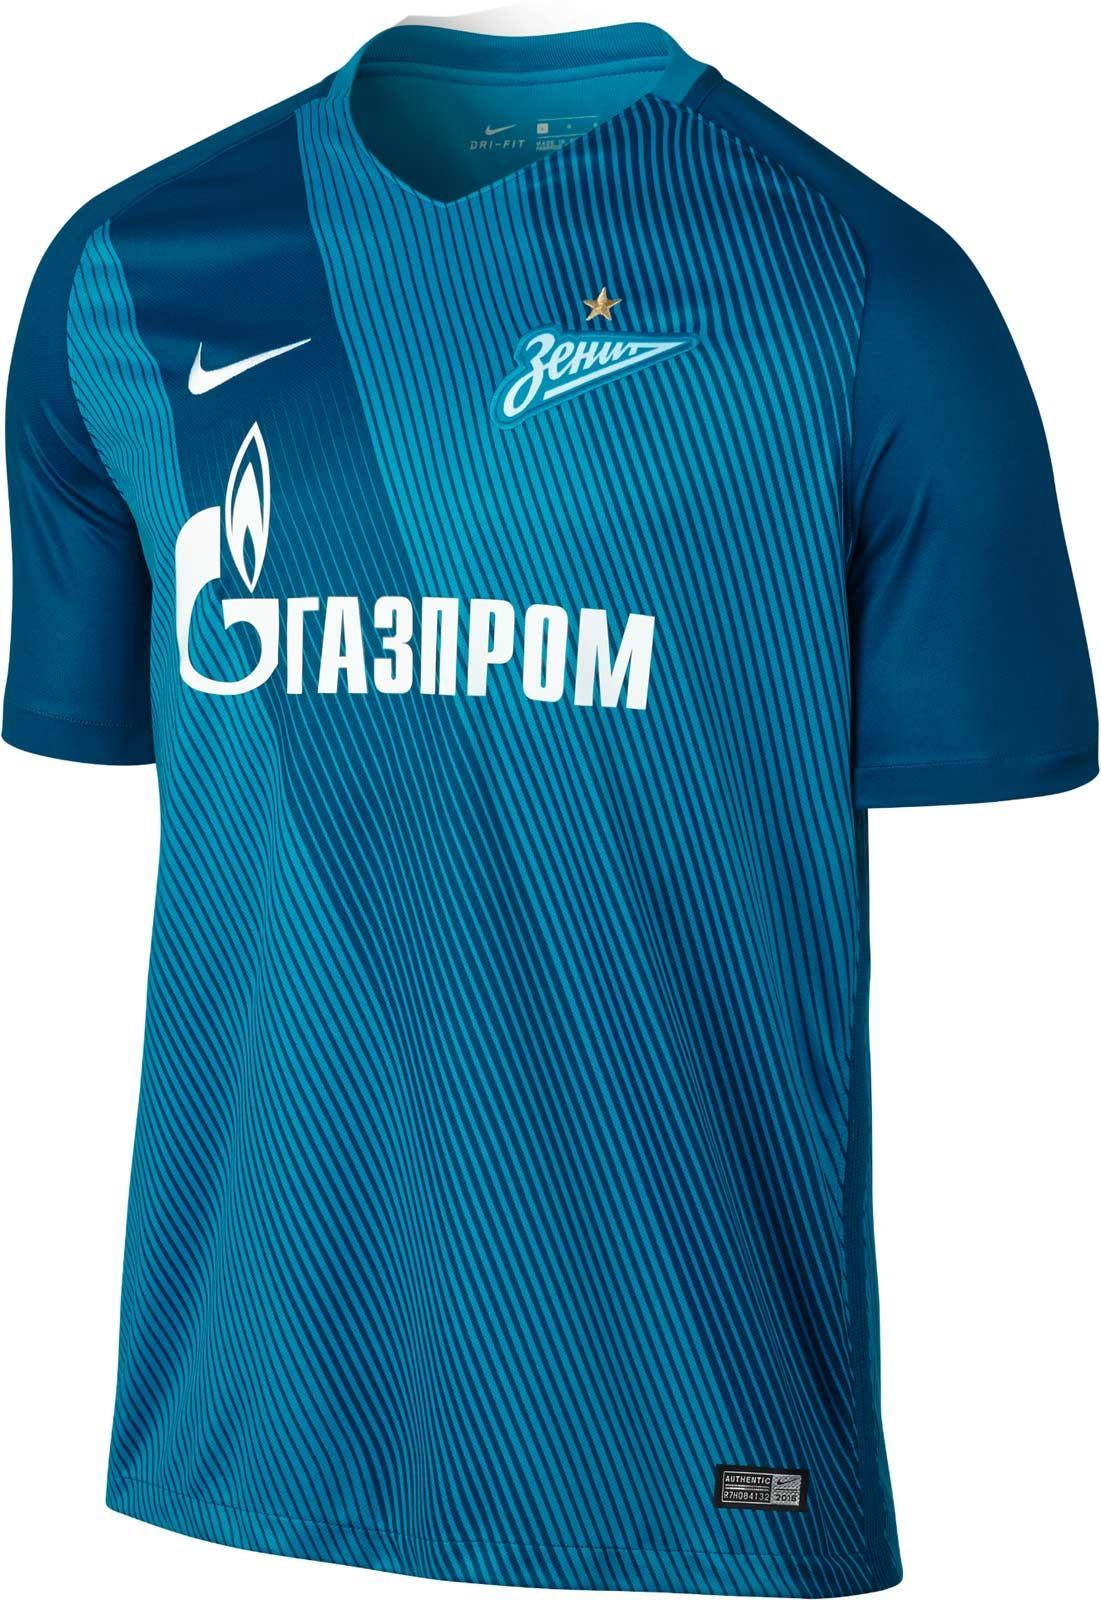 Design a t shirt kit - The New Zenit St Peterbsburg 2016 17 Kit Boasts An Outstanding Design